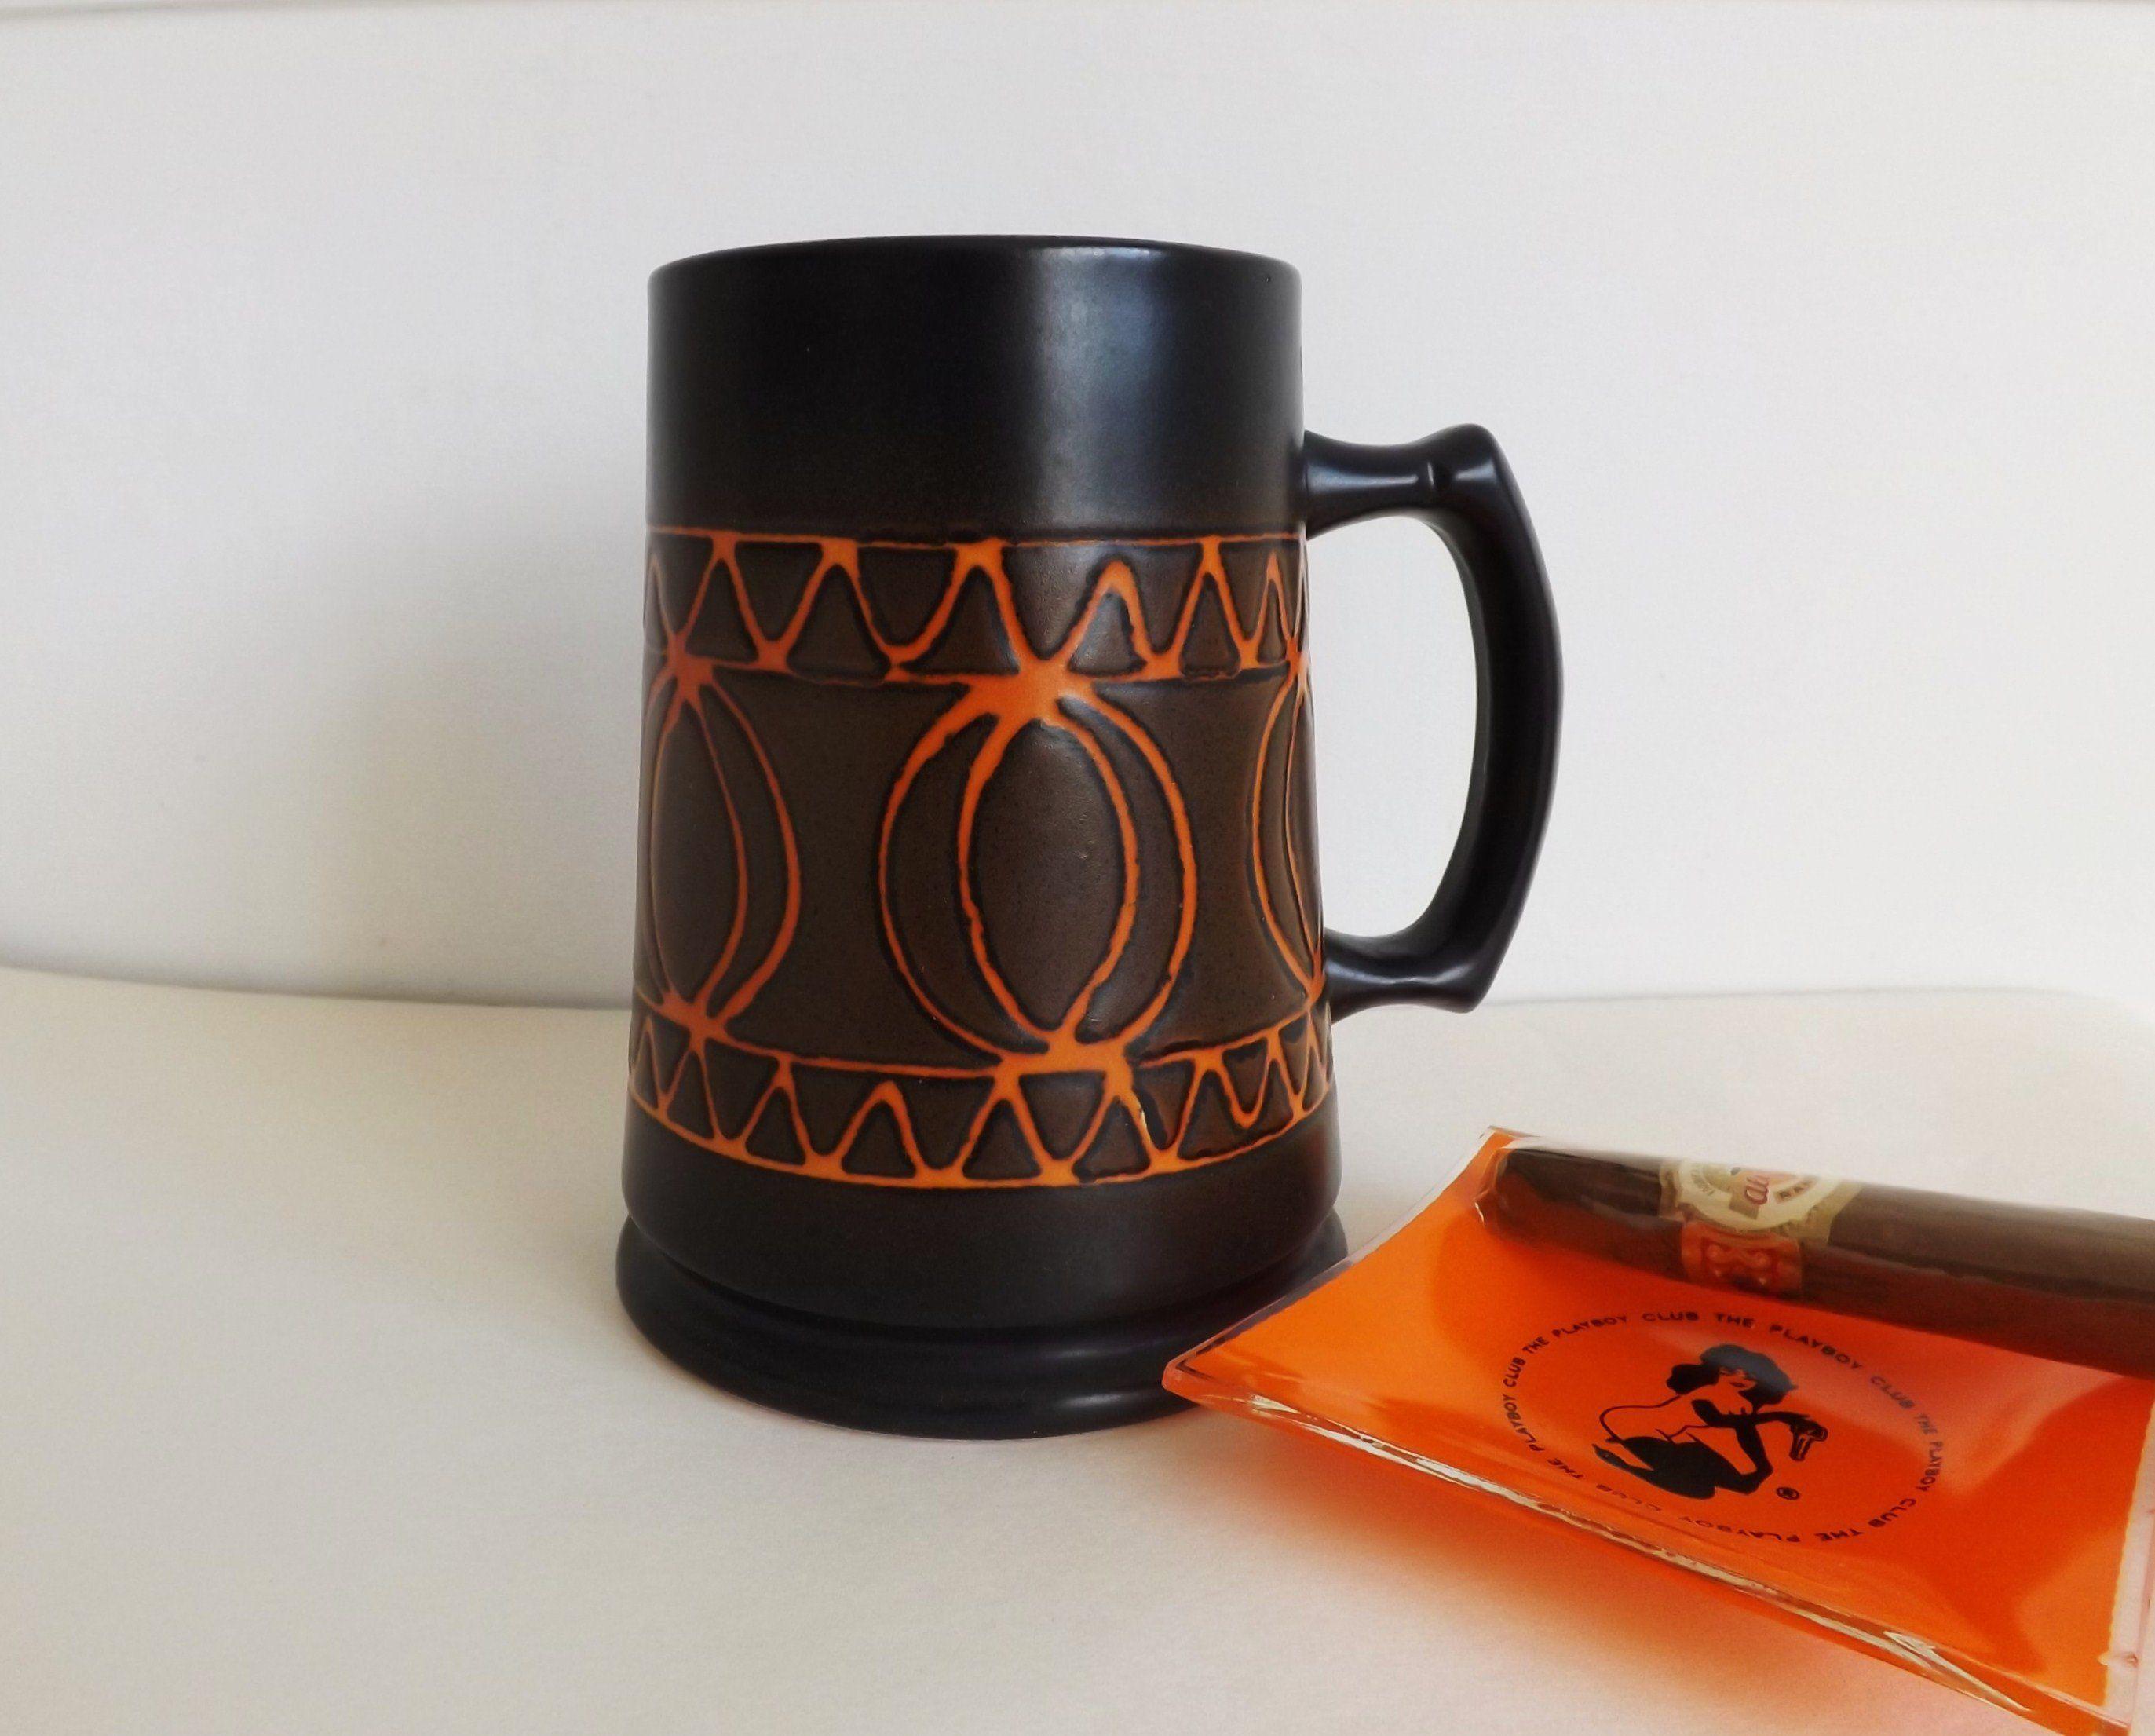 Antiques Ceramics & Porcelain Pitcher Beer Jug Ceramics Brown White Lava Decor Very Decorative